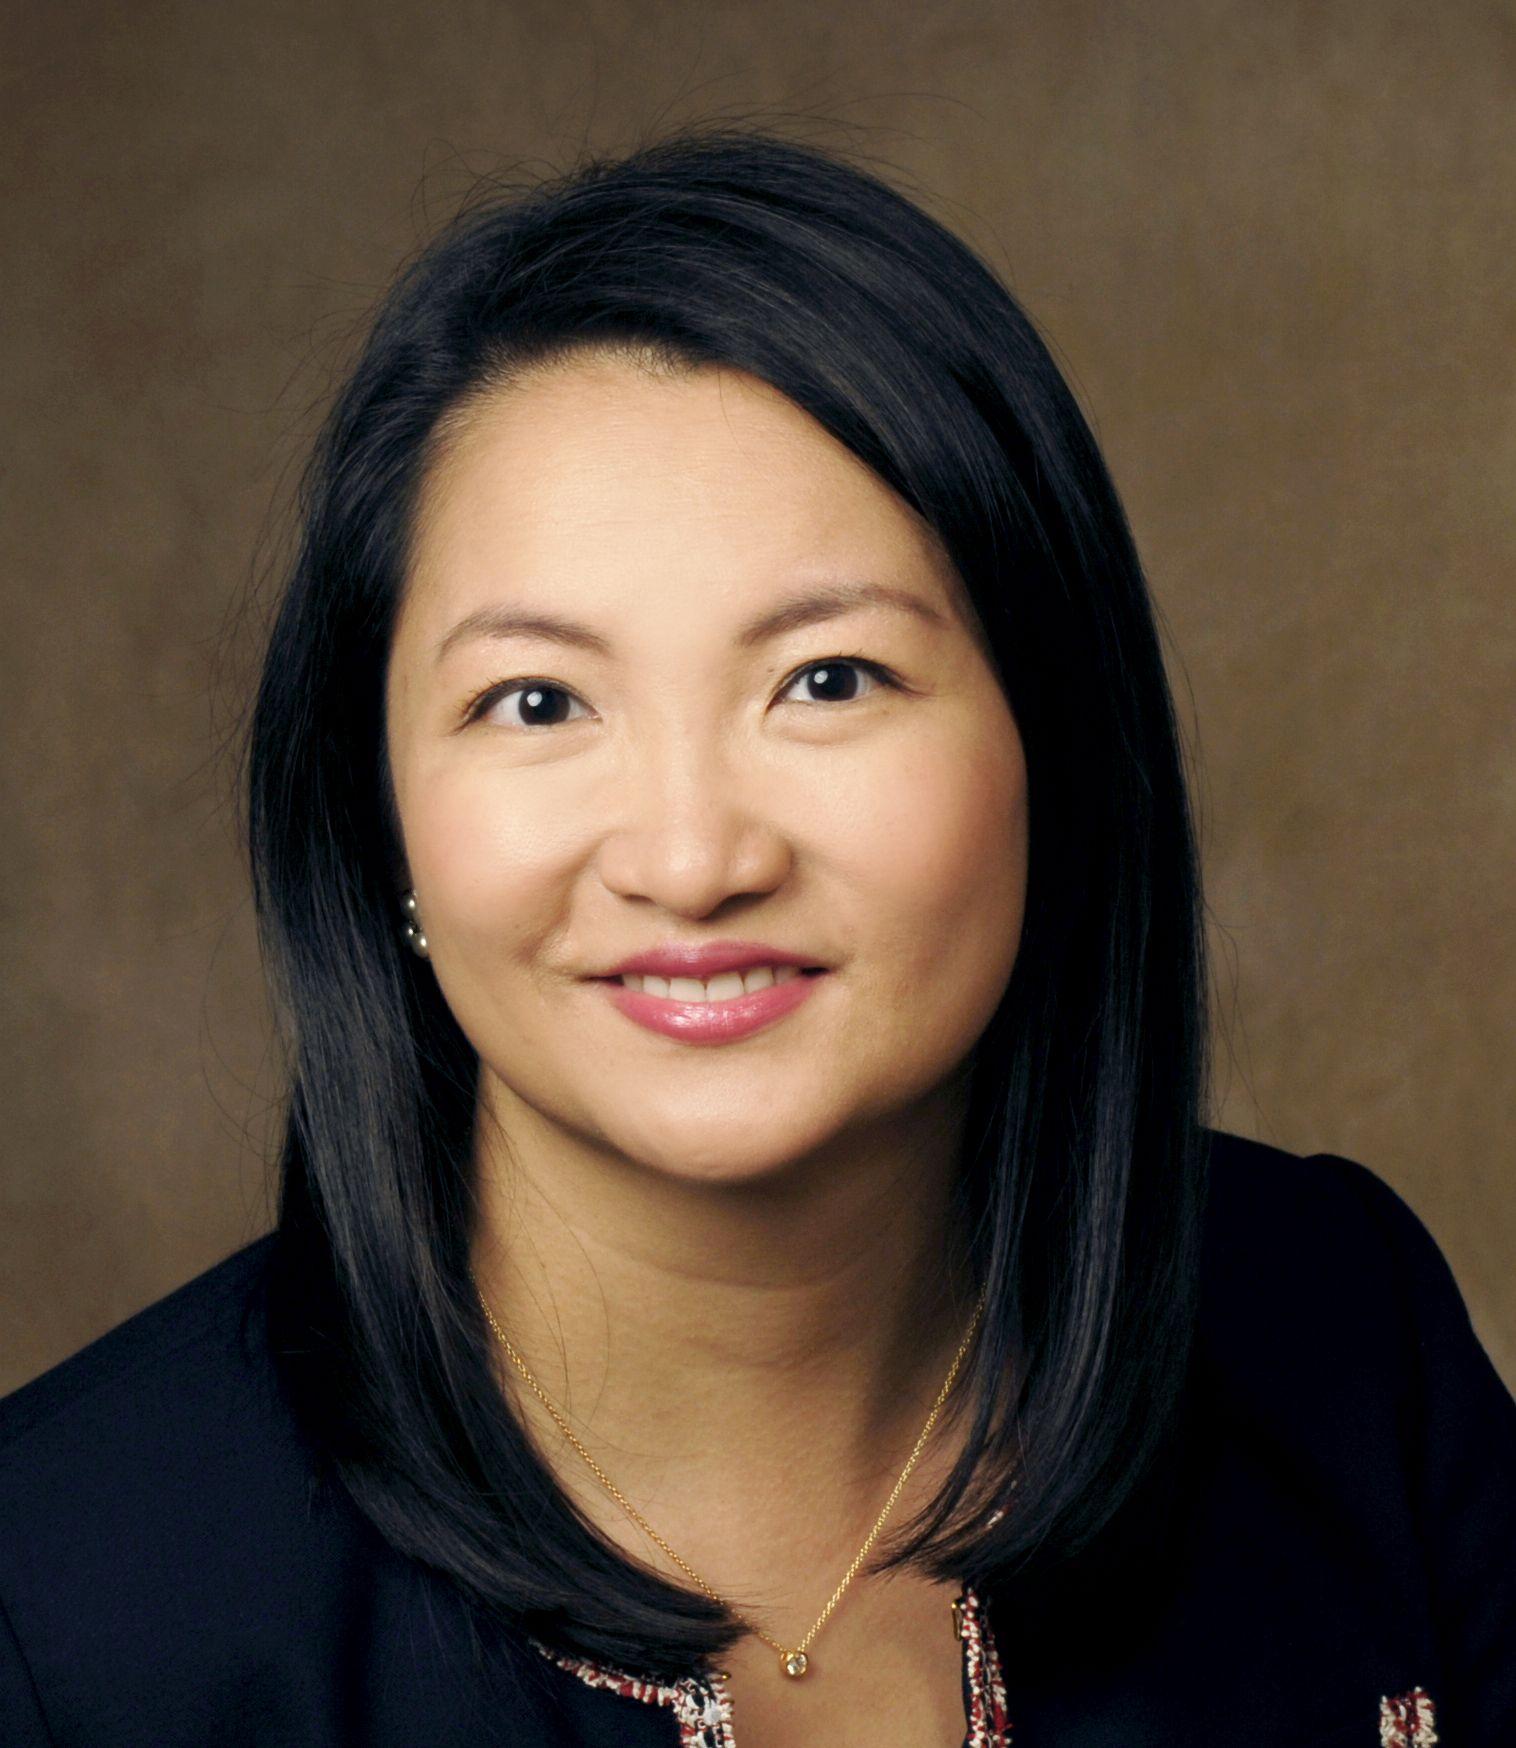 Jane Yue Zhang